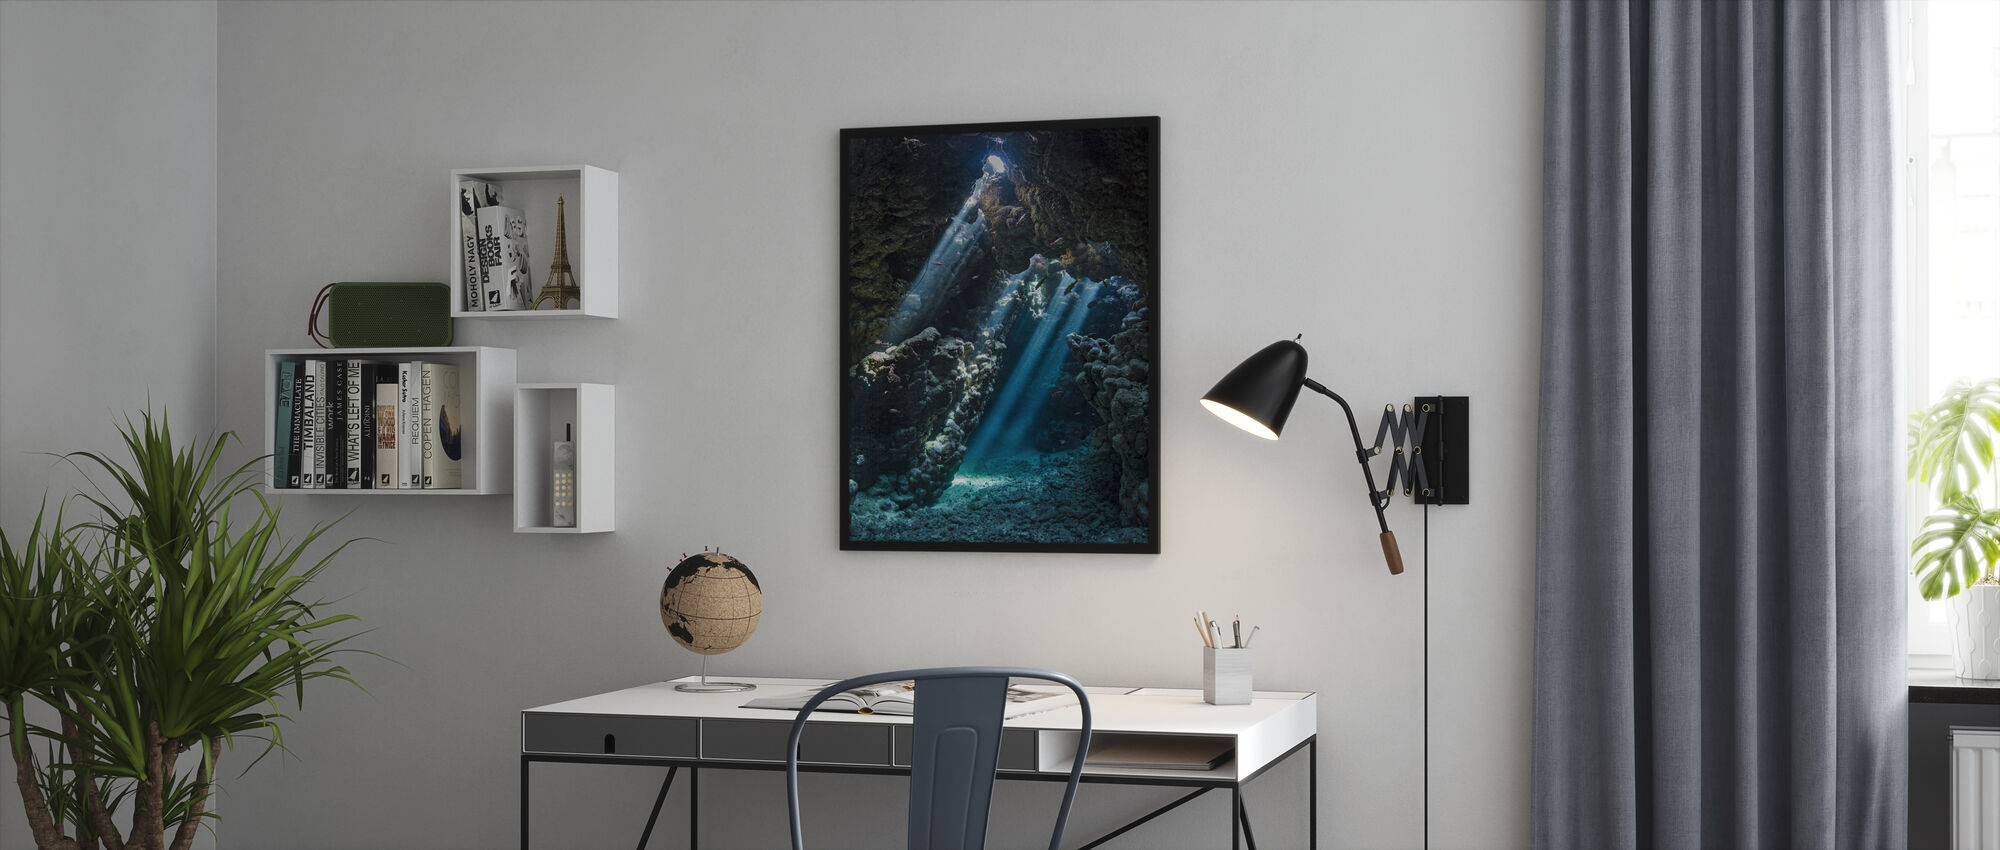 Underwater Cavern - Framed print - Office